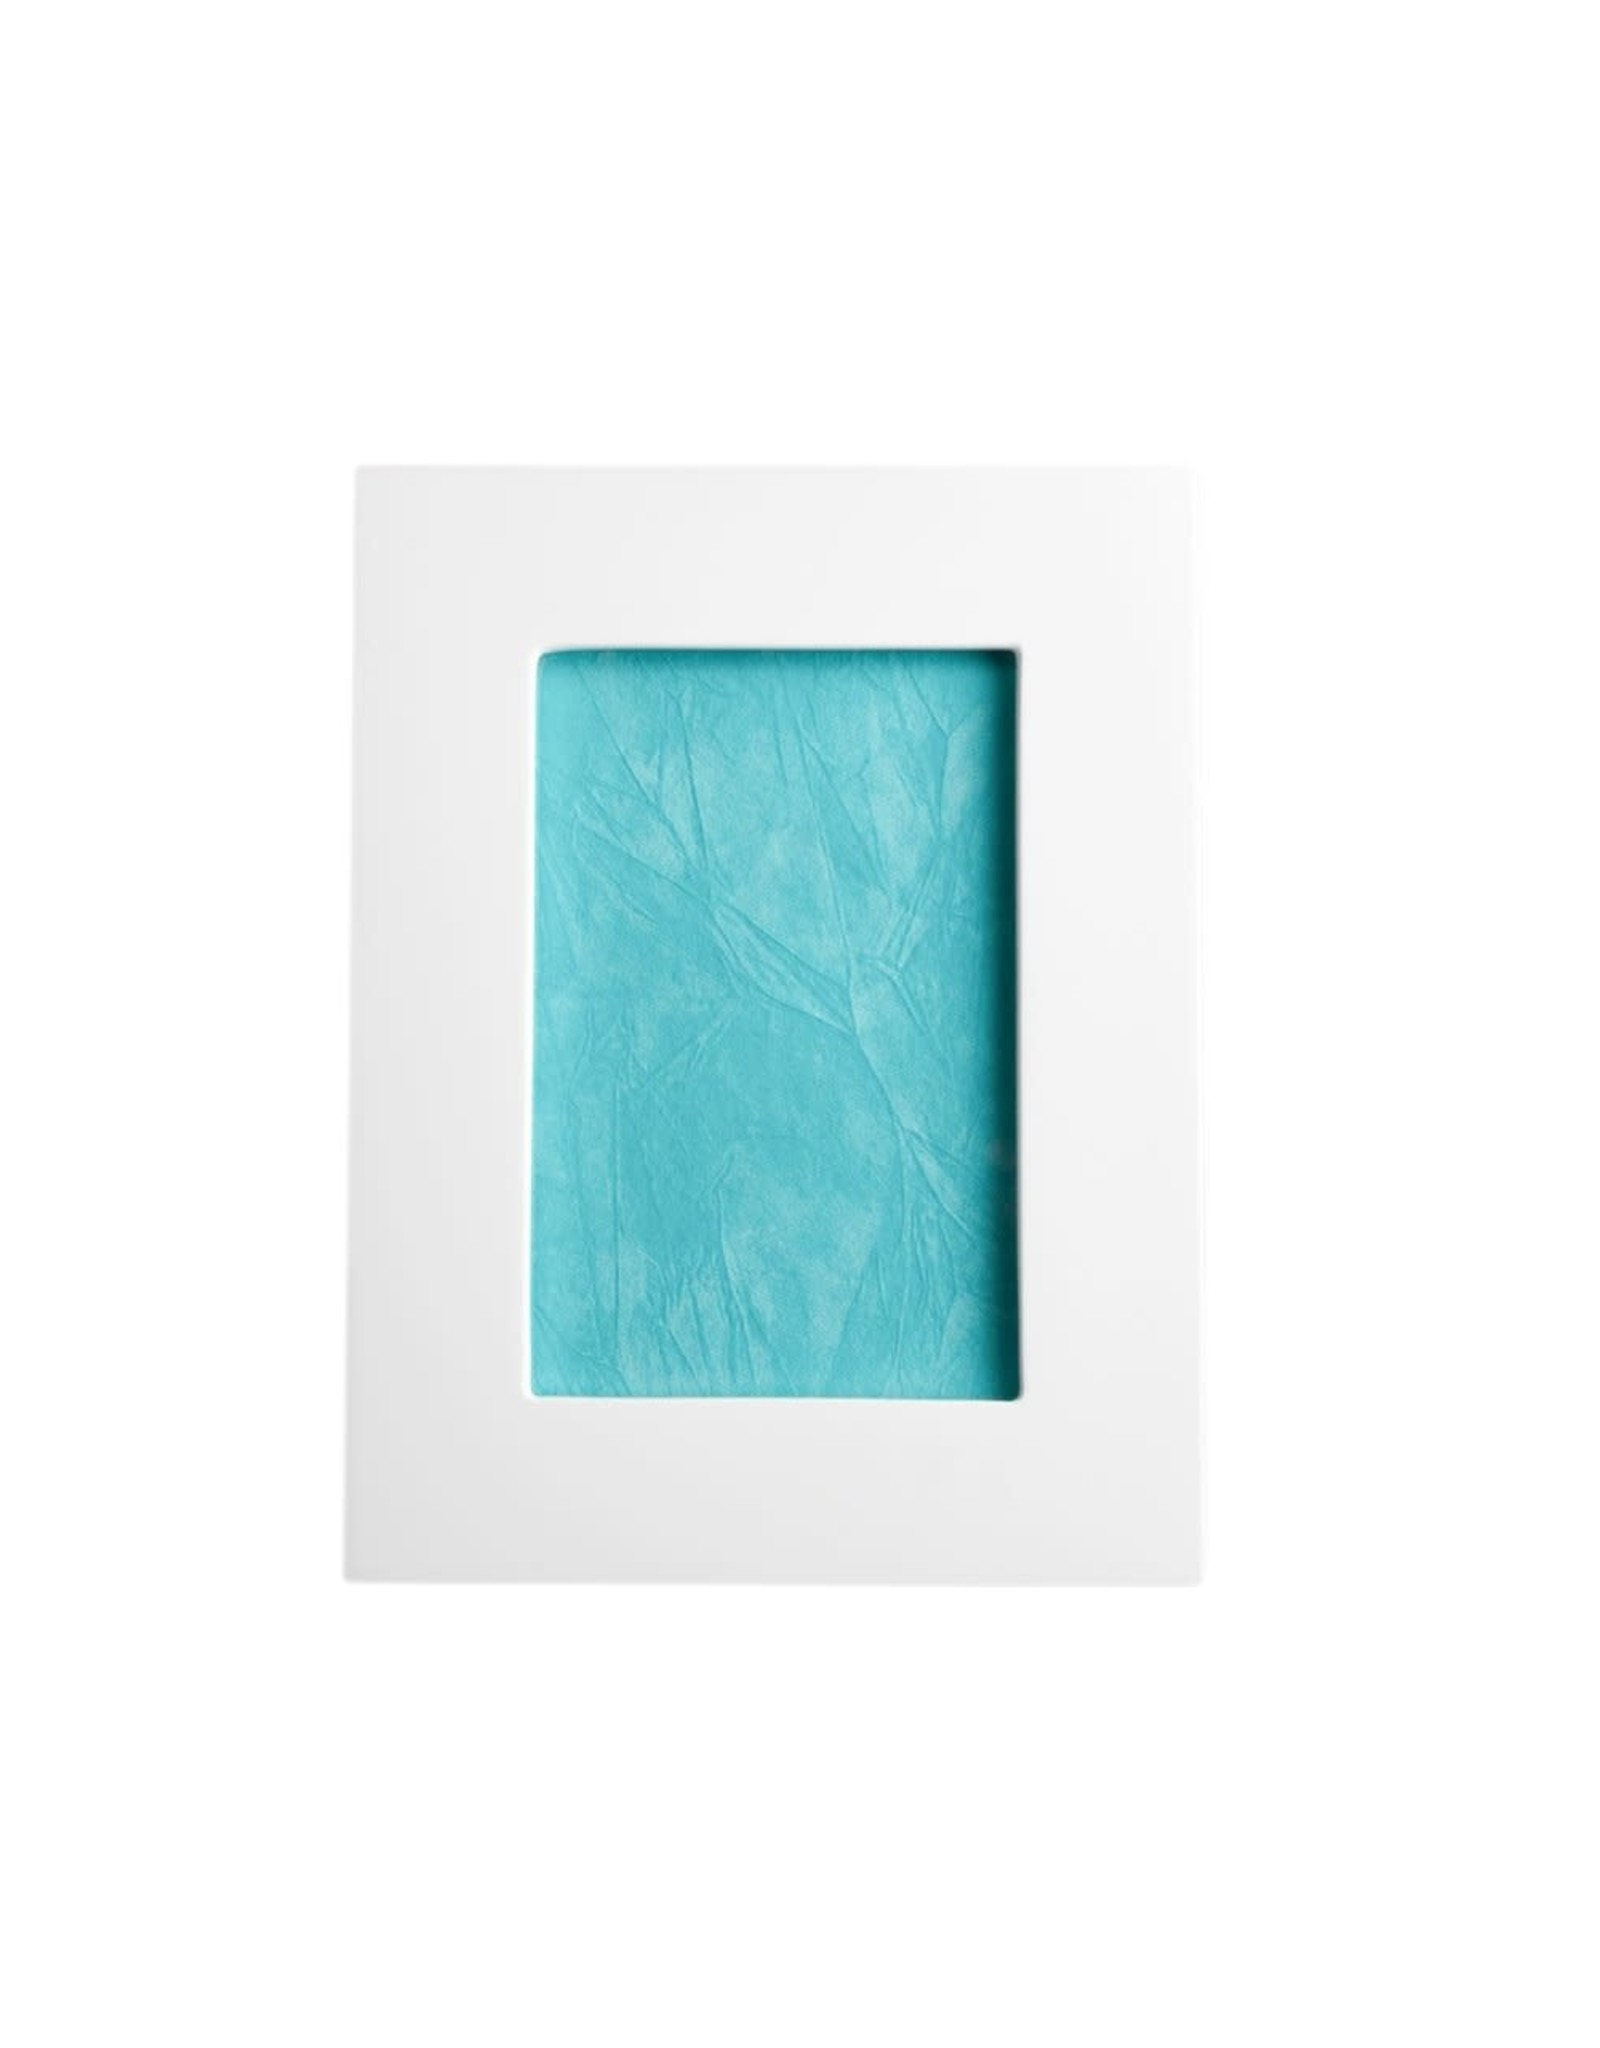 Brouk & Co Frame 4x6 Kendall White